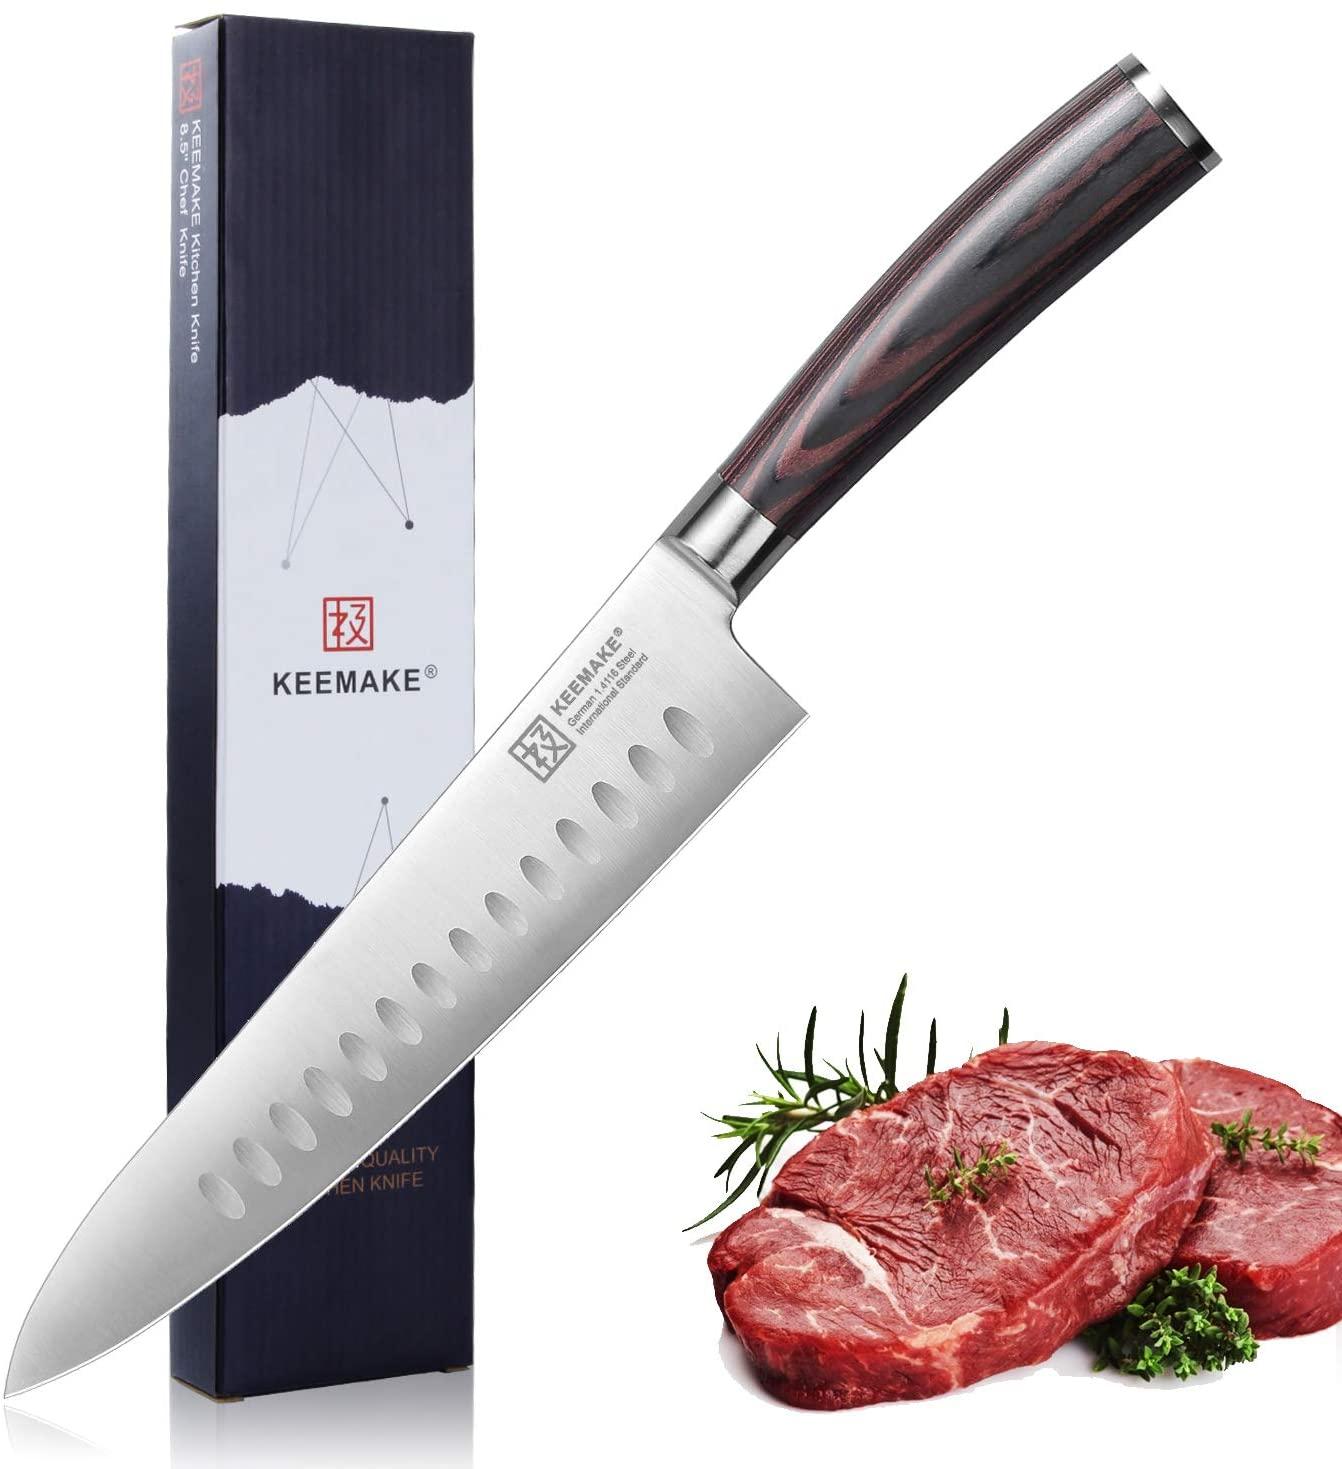 Santoku Knife-8.5 inch Japanese Chef Knife-High Carbon Stainless German Steel 1.4116-Egonomic Pakkawood Handle-All Purpose Extra Large Kitchen Knife-Keemake